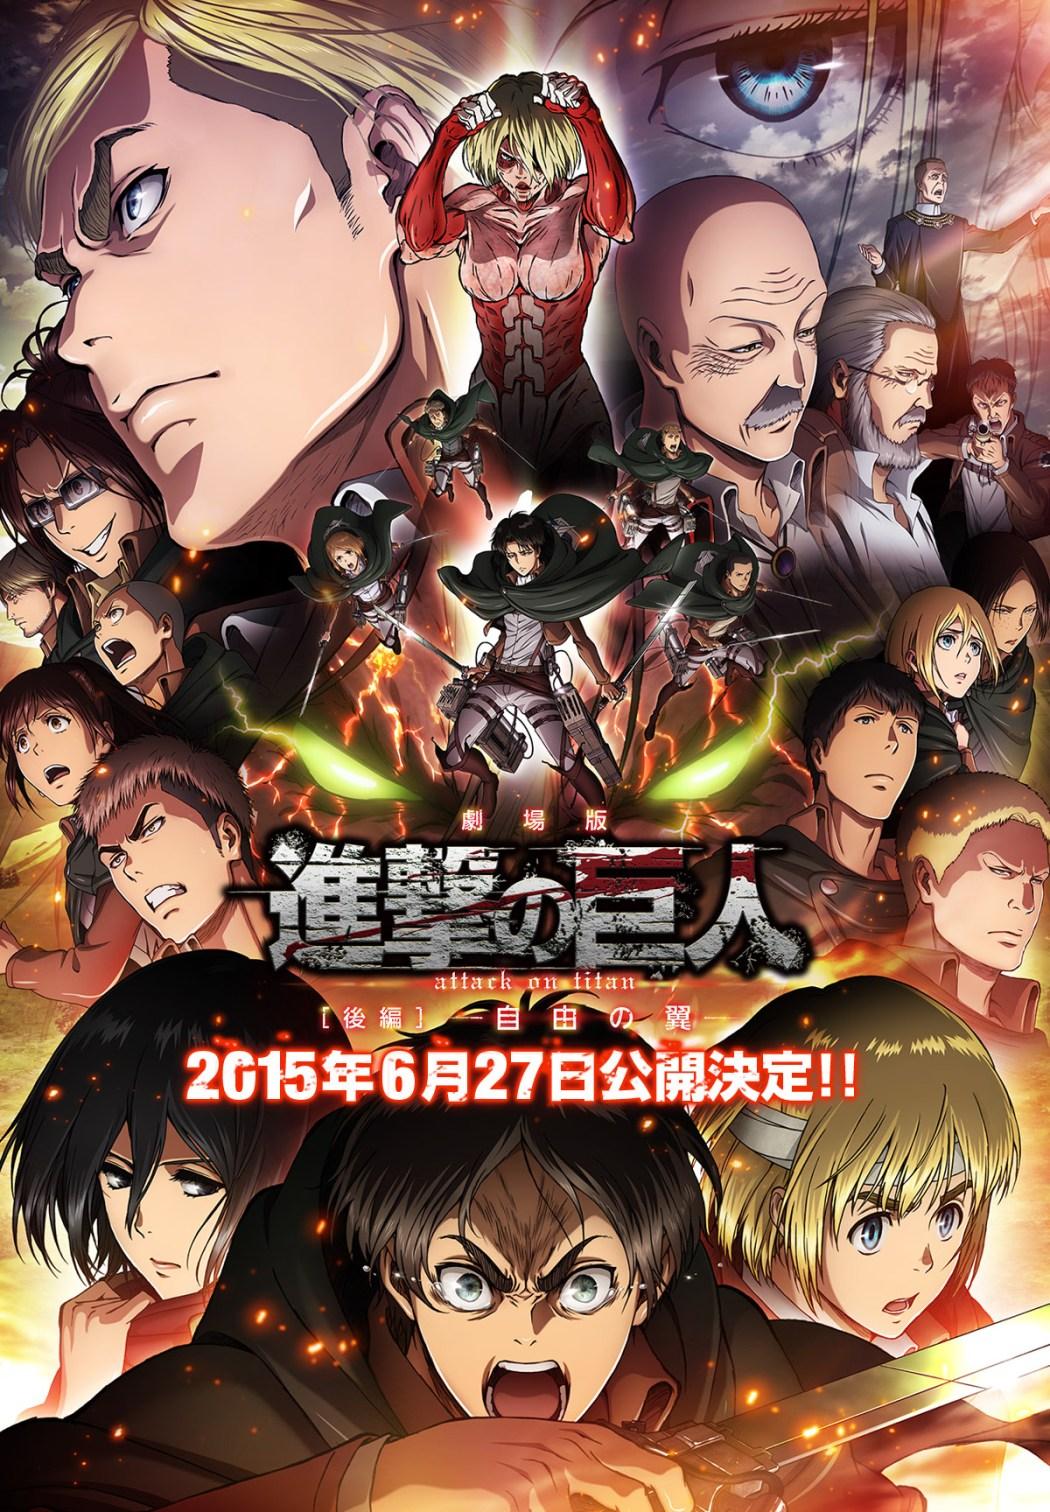 New Key Visual for the 2nd Attack on Titan Movie haruhichan.com 2nd shingeki no kyojin movie visual